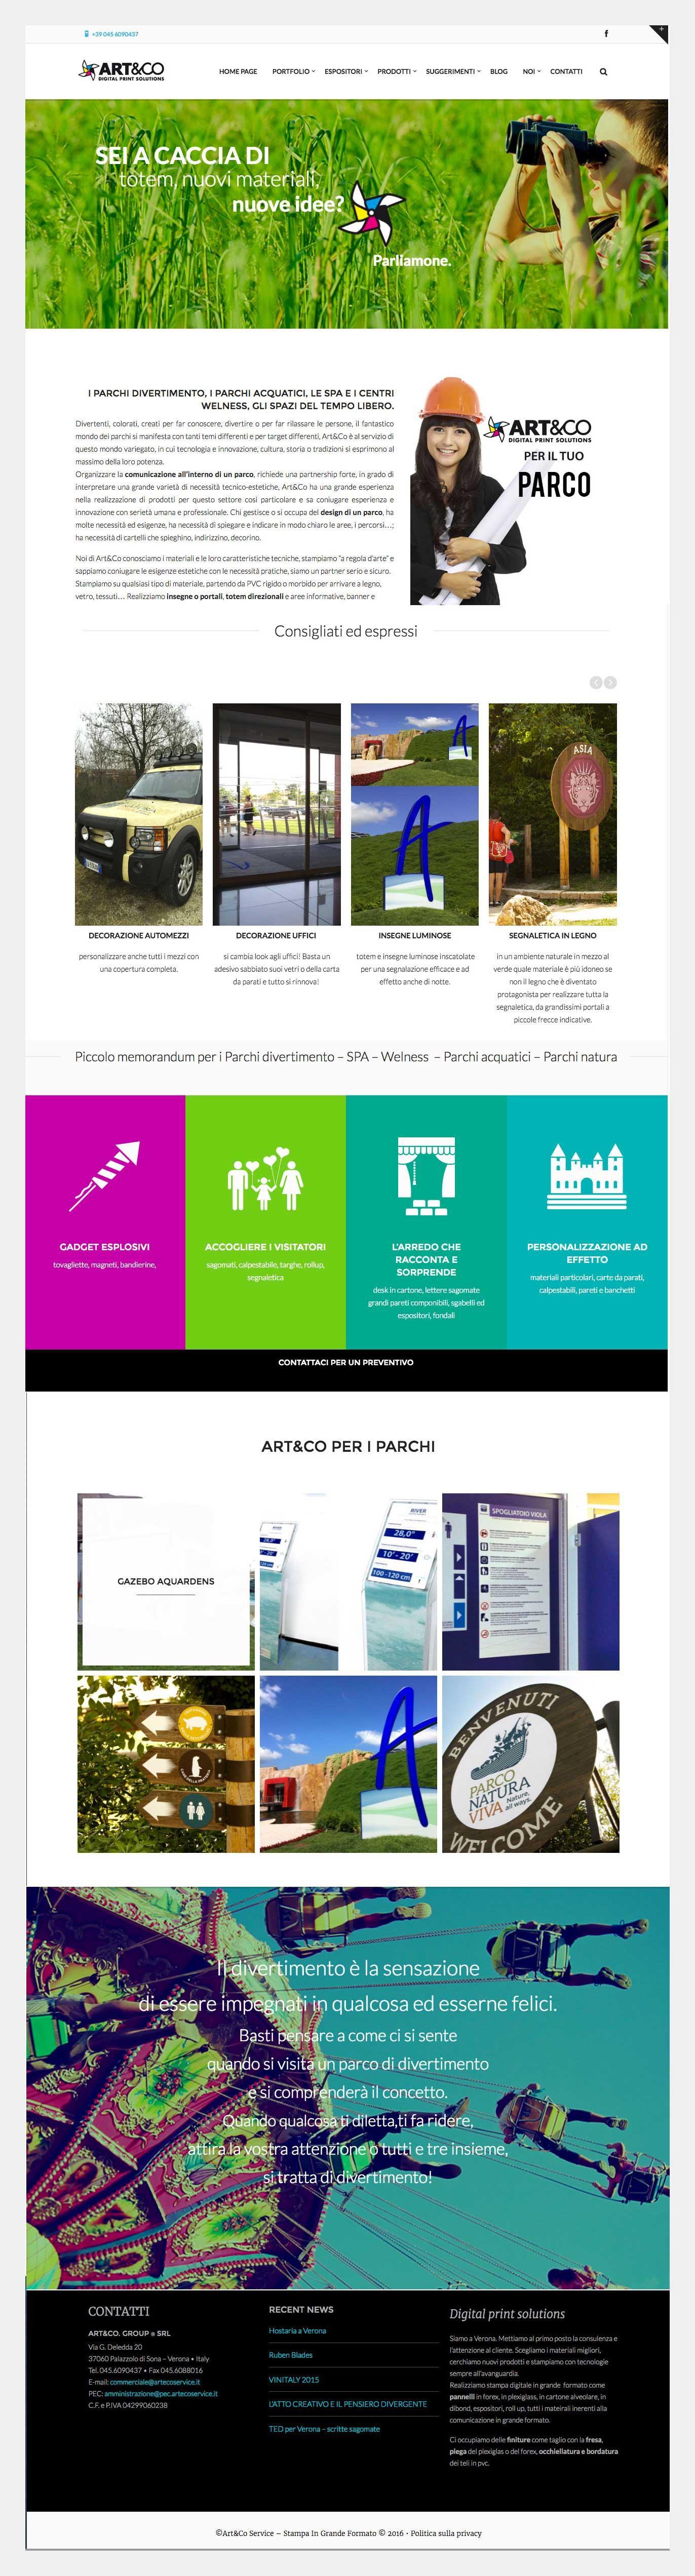 Web design omanu Arteco service